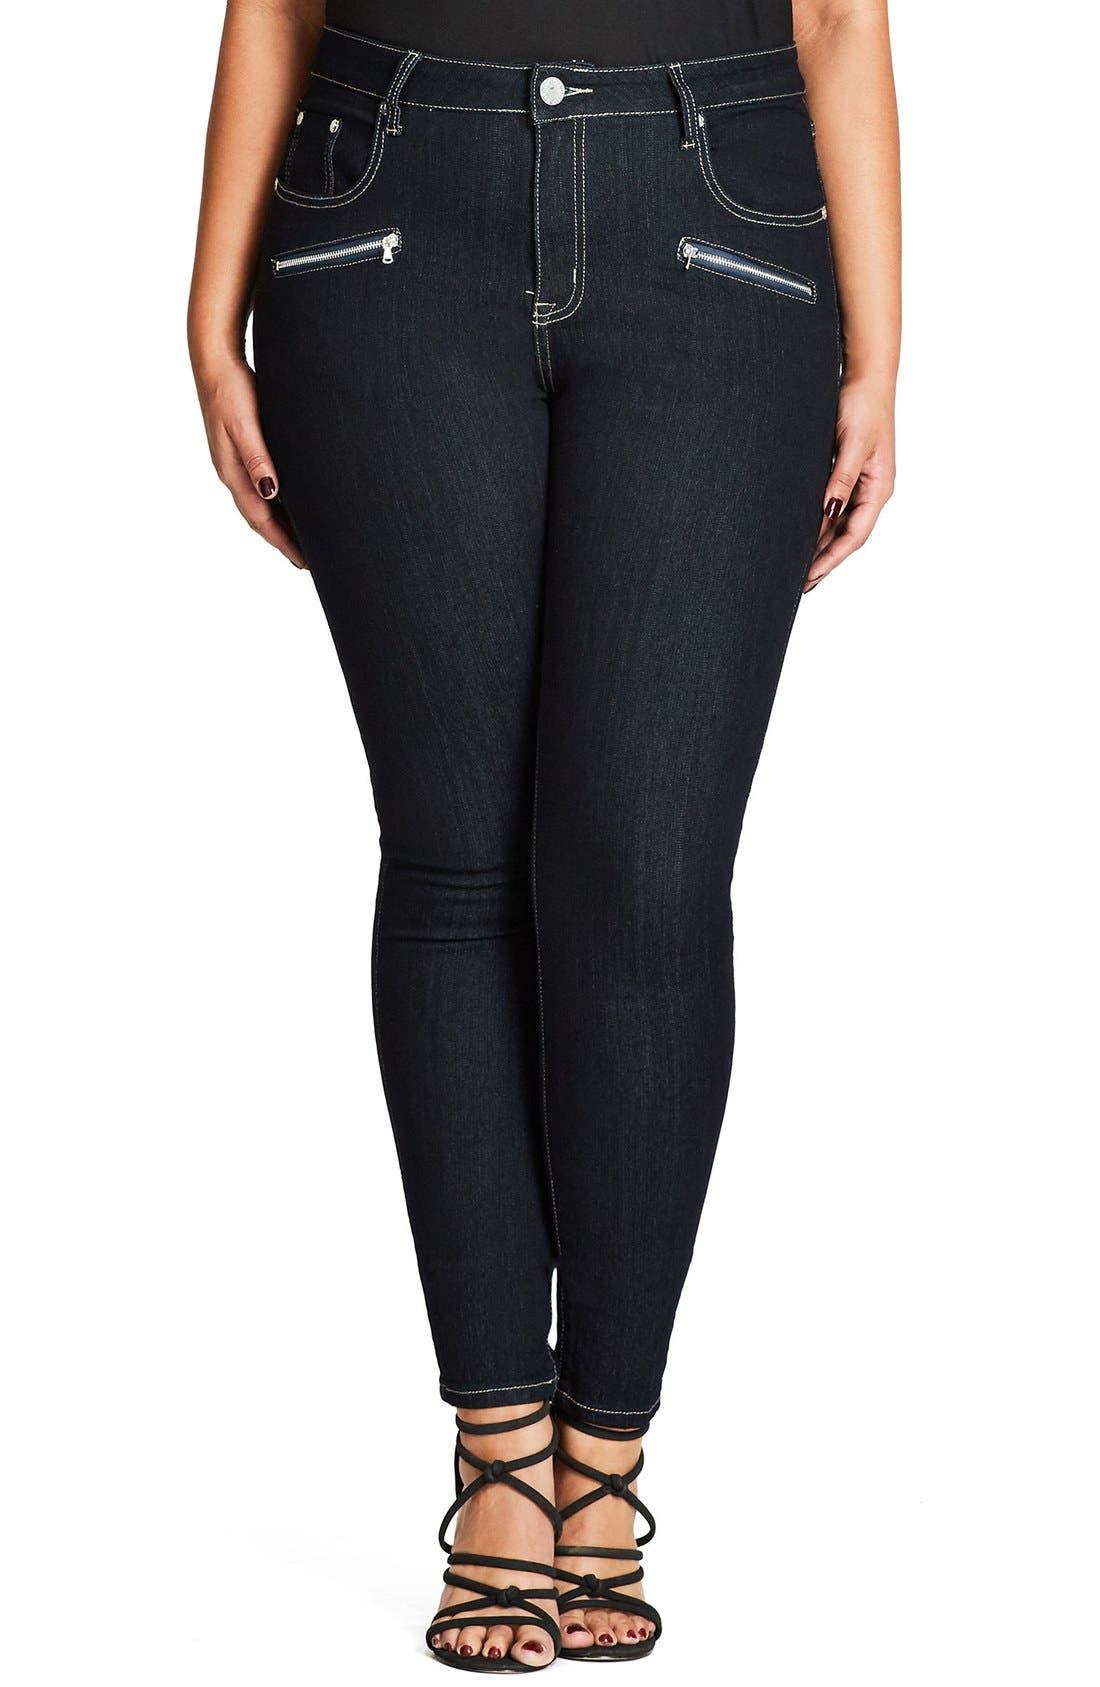 Main Image - City Chic Glam Zip Skinny Jeans (Dark Denim) (Plus Size)